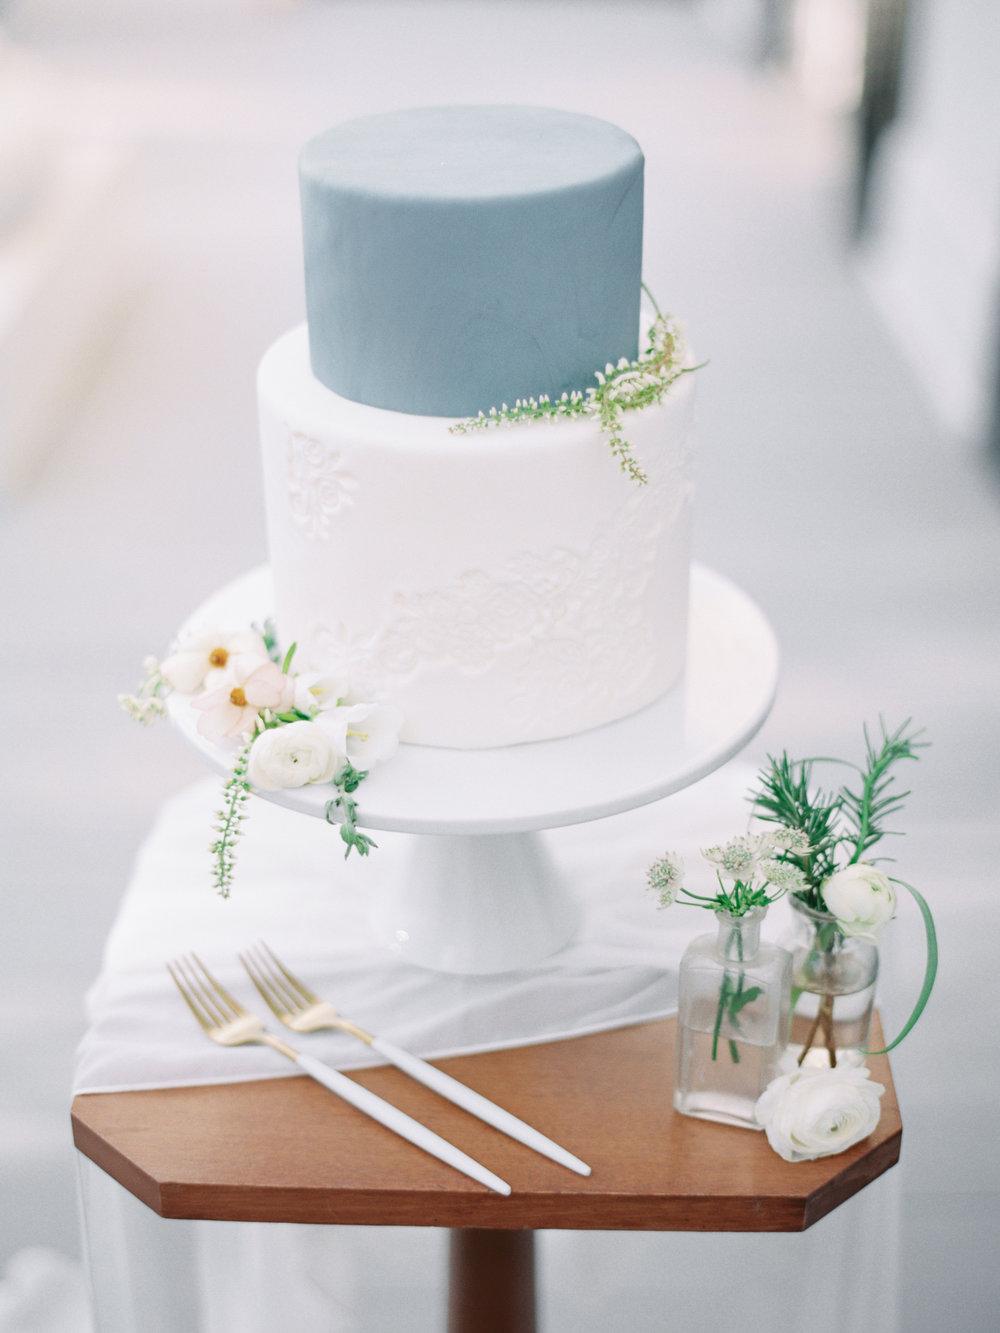 Minimalist White and Gray Aesthetic Wedding Cake with Silk Chiffon White Table Runner